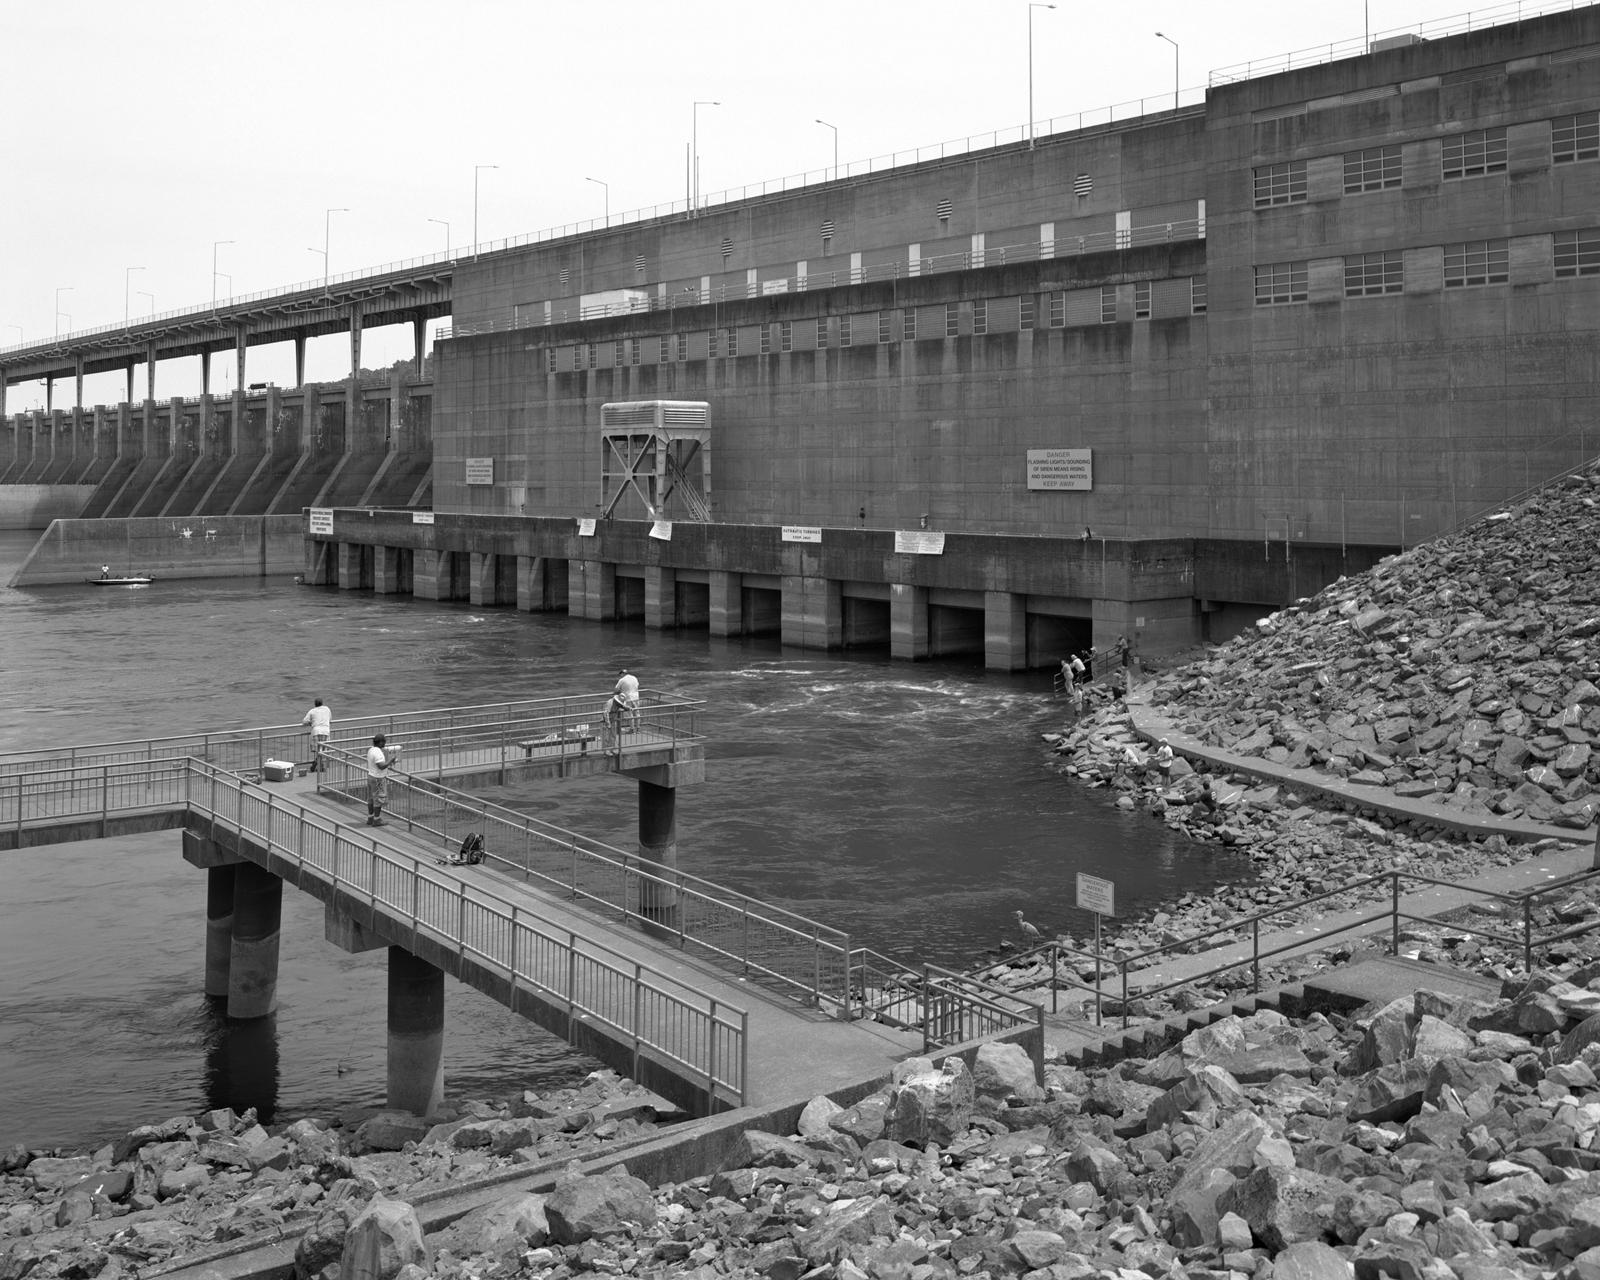 Chickamauga Dam, Tennessee River, TN  2014